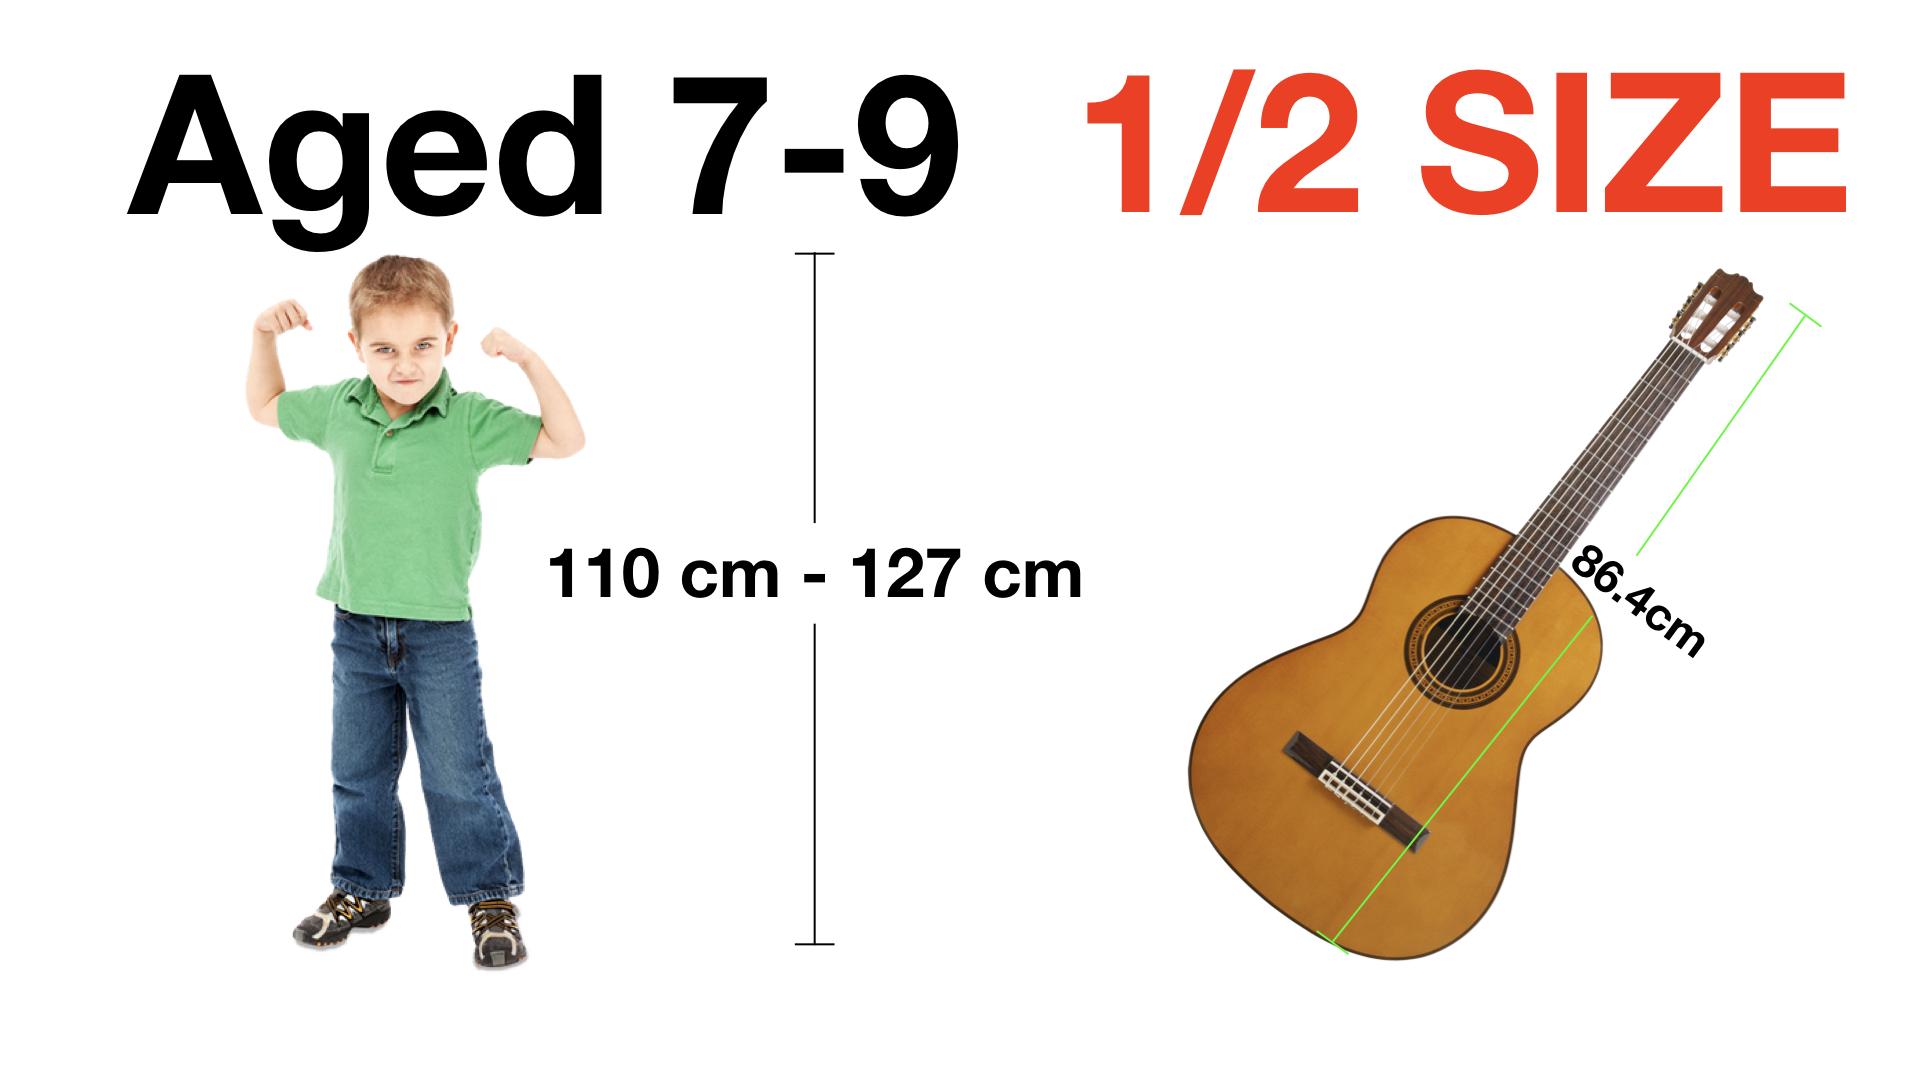 Adrian Curran Starter Guitar Aged 7 - 9